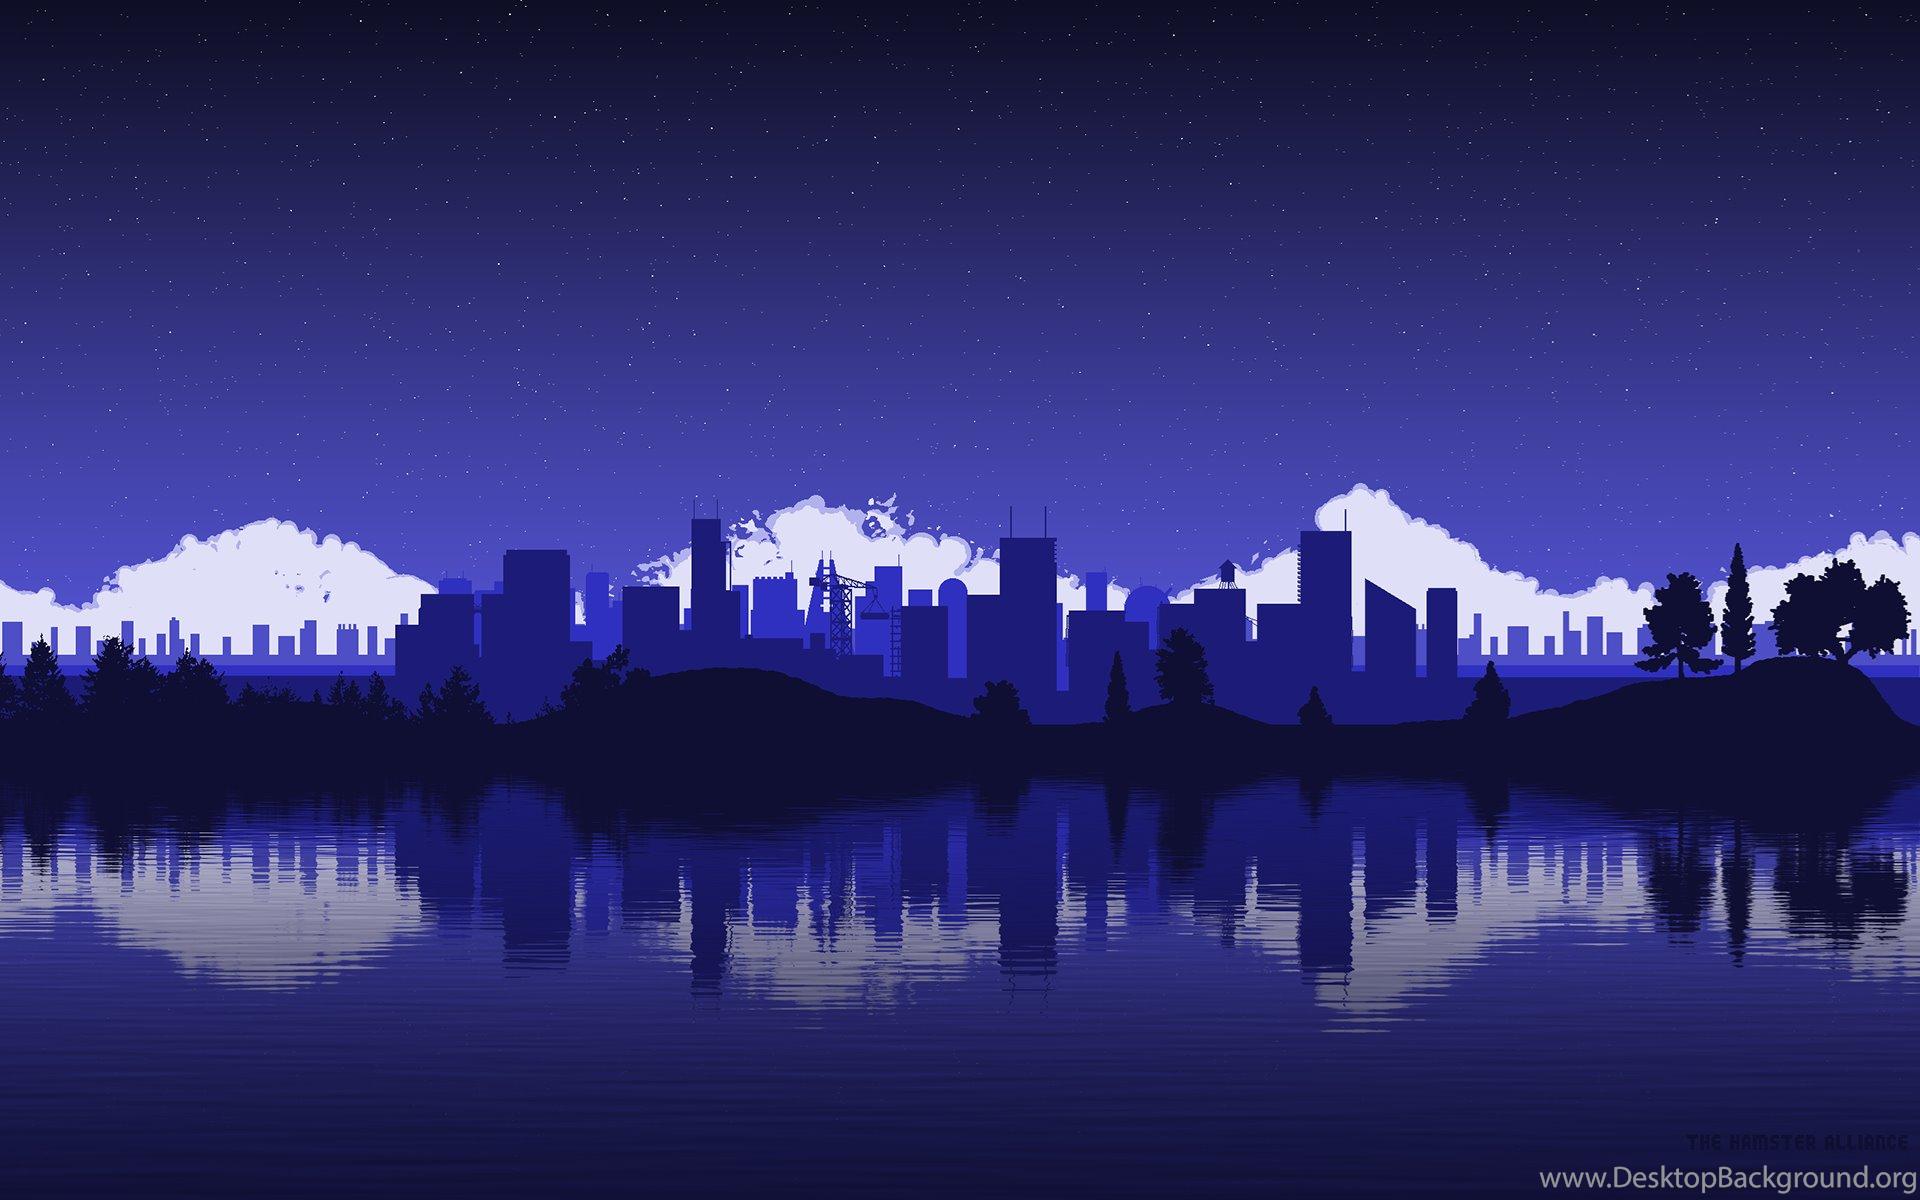 Sick tumblr backgrounds wallpapers 19 pixel art wallpapers that will make your desktop retro voltagebd Gallery